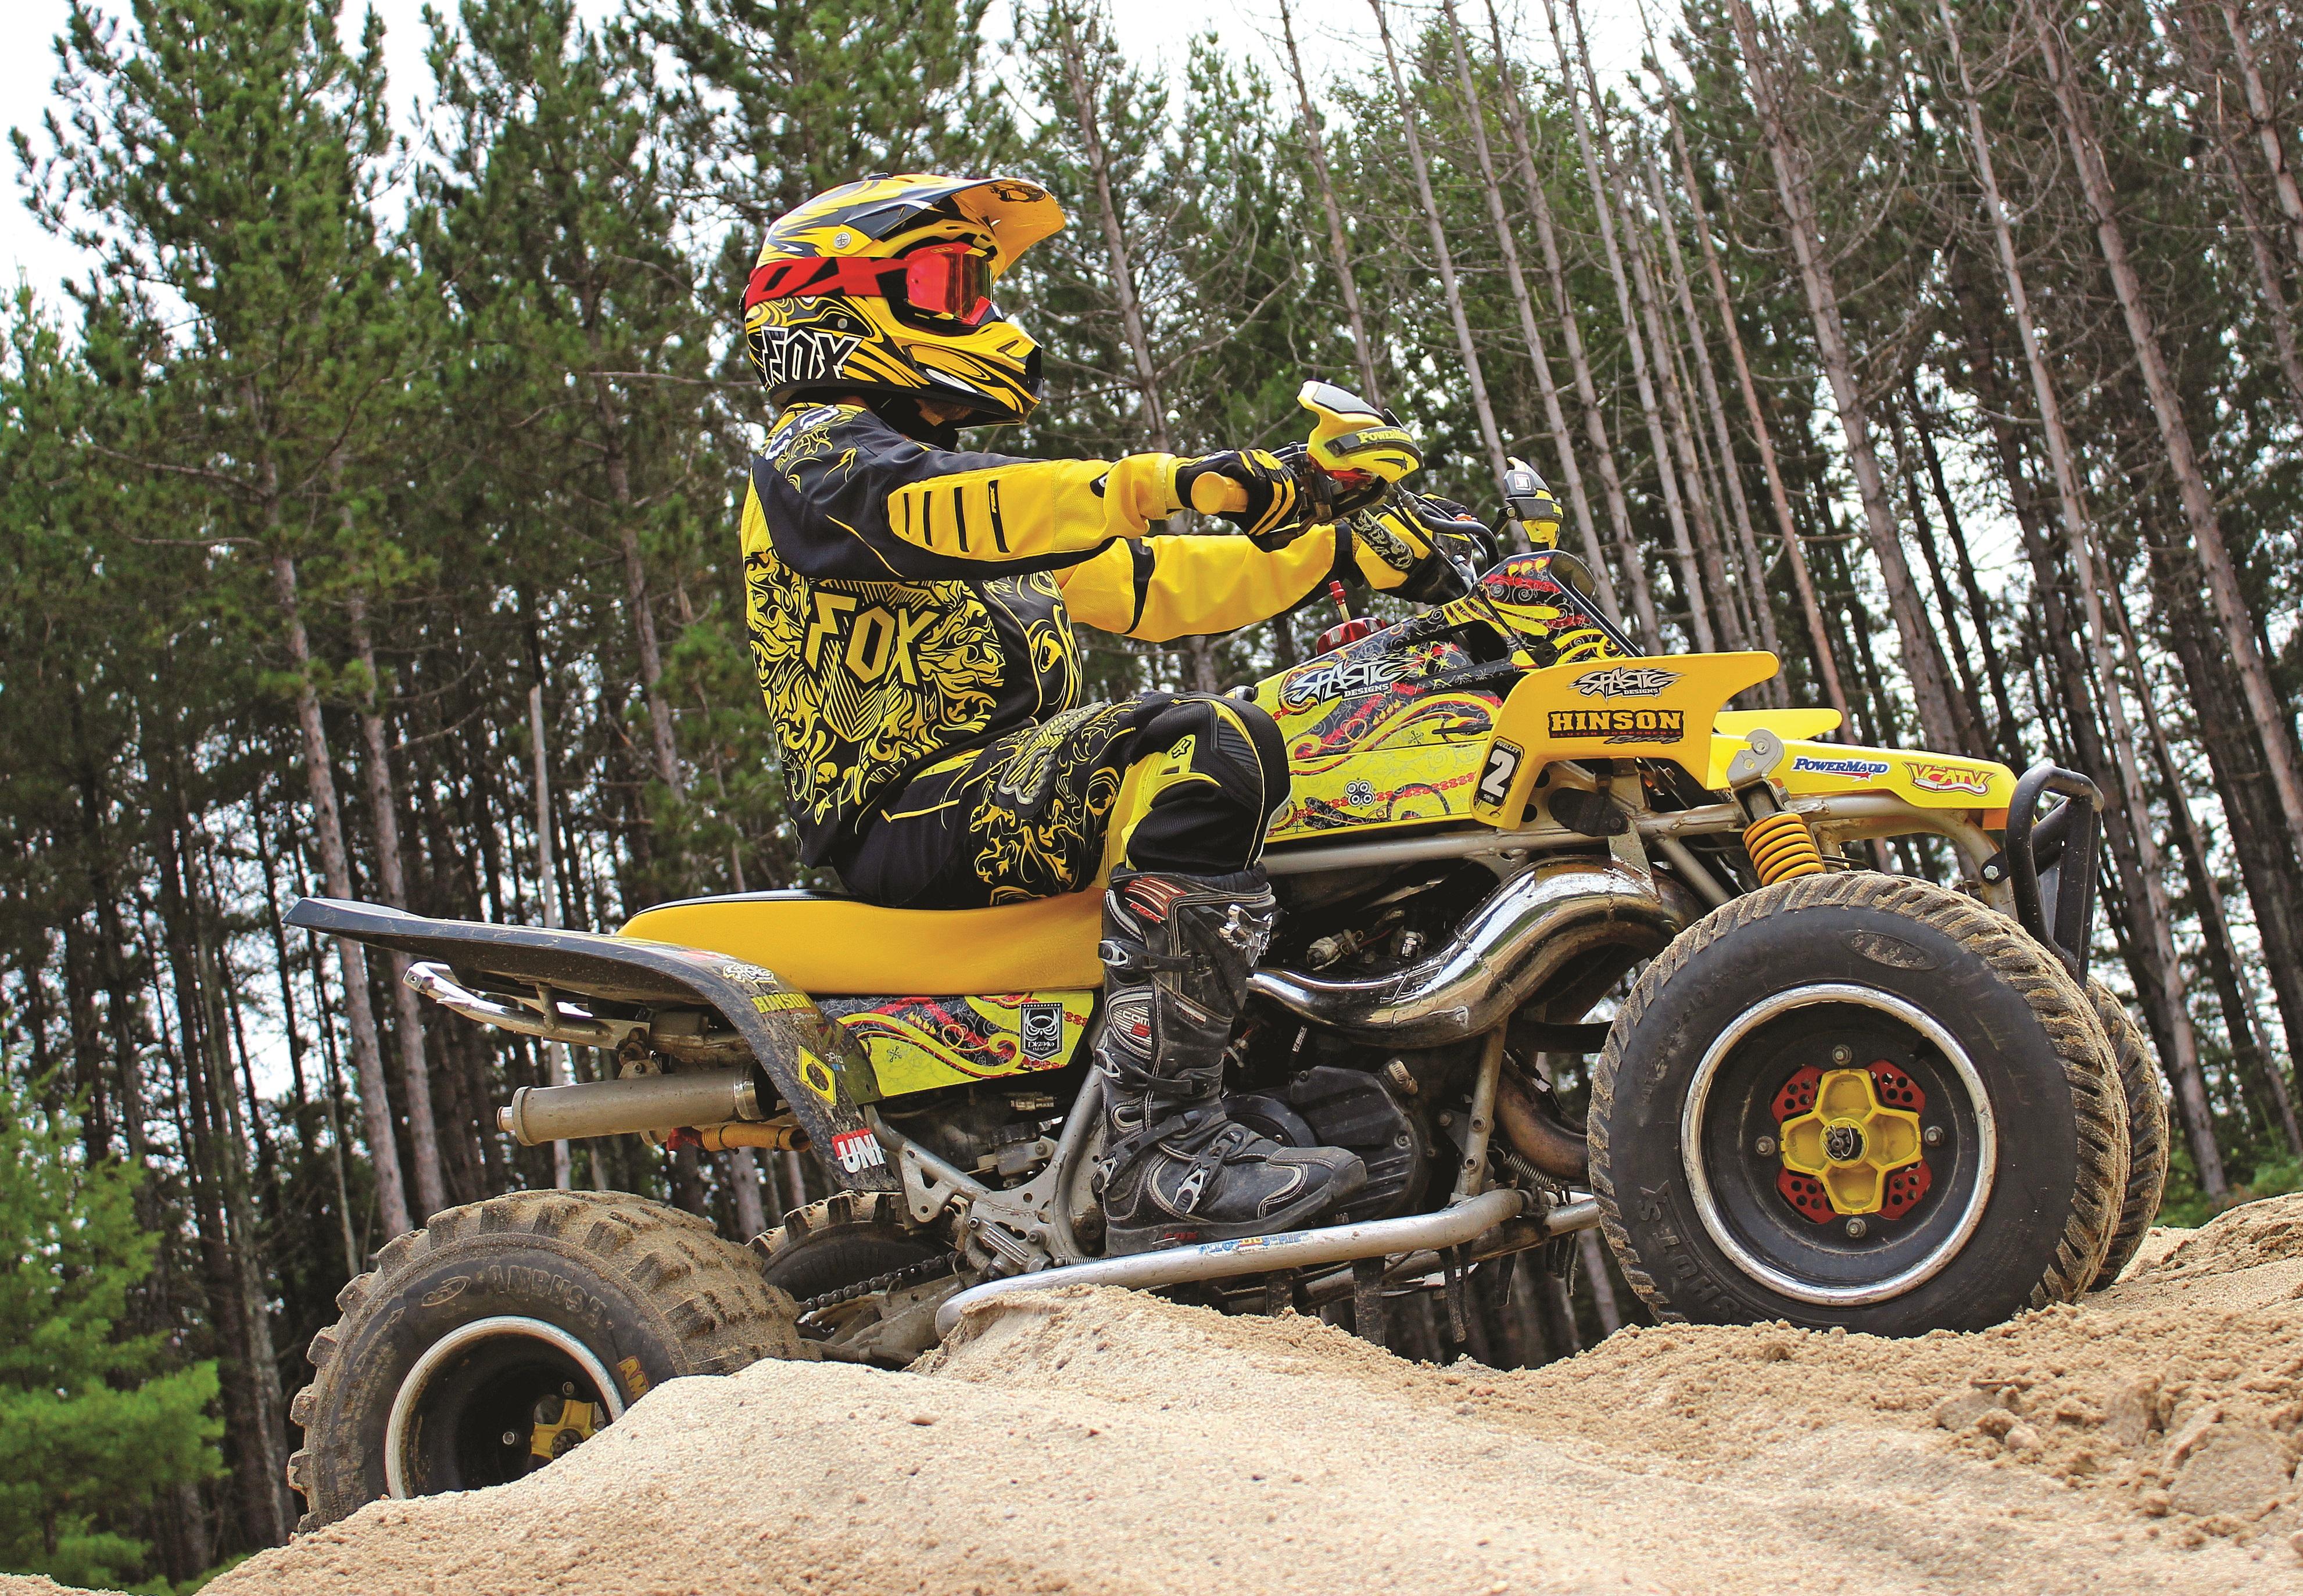 READER'S RIDES: Yamaha's Banshee is still alive! | Dirt